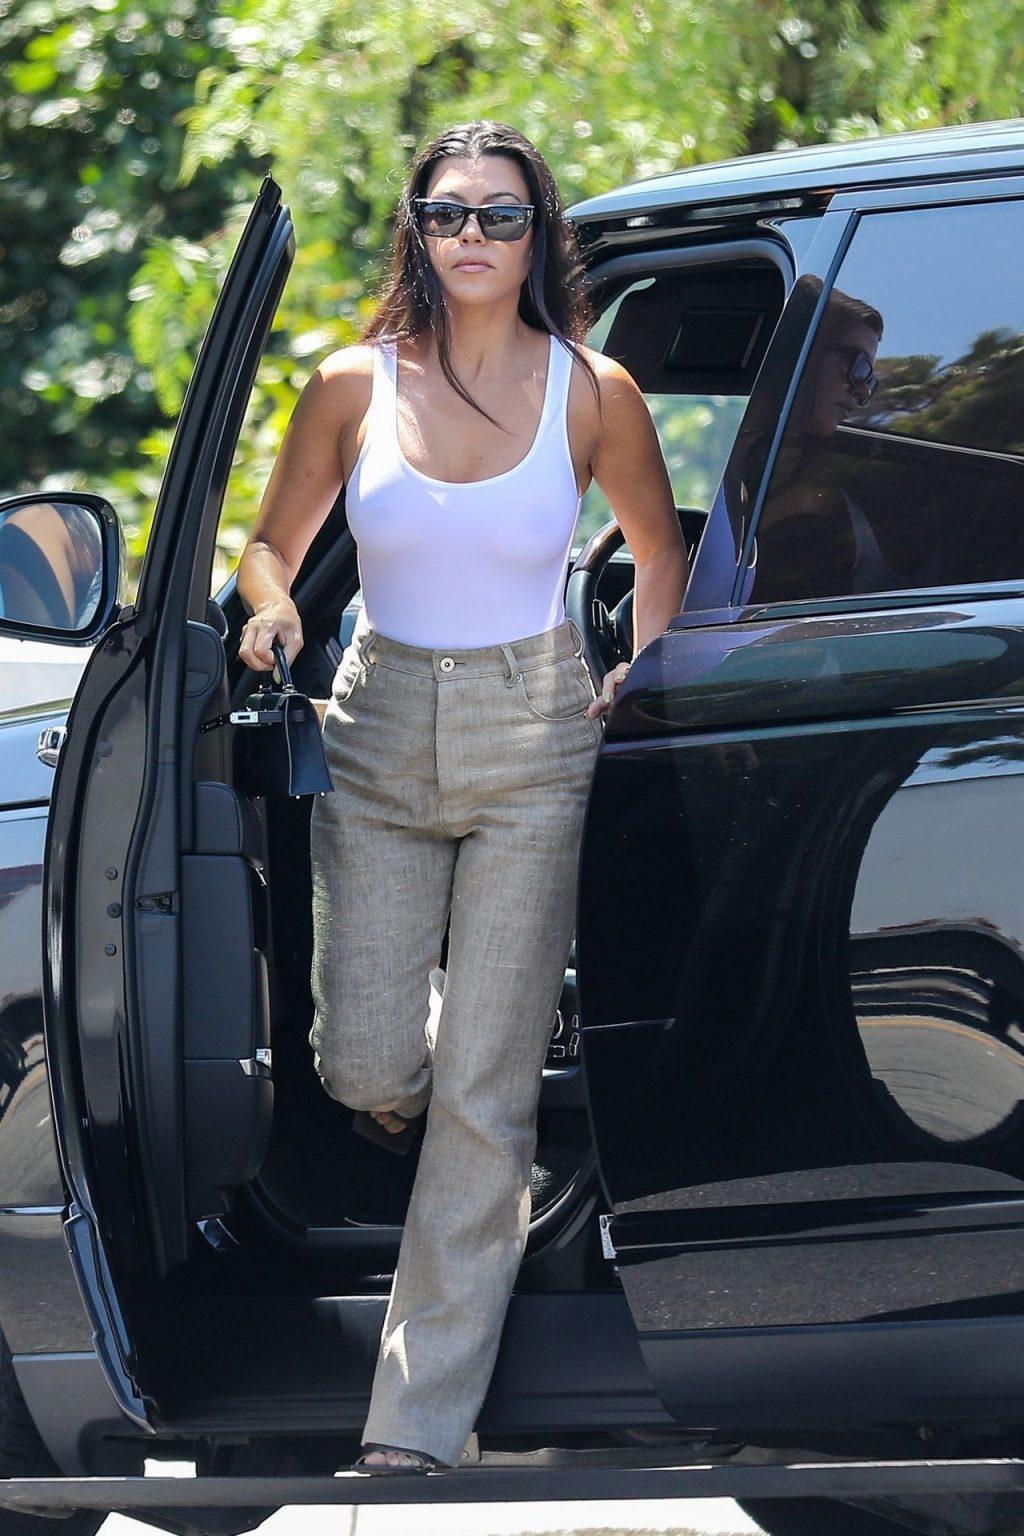 Kourtney Kardashian See Through Thefappeningblog Com 12 1024